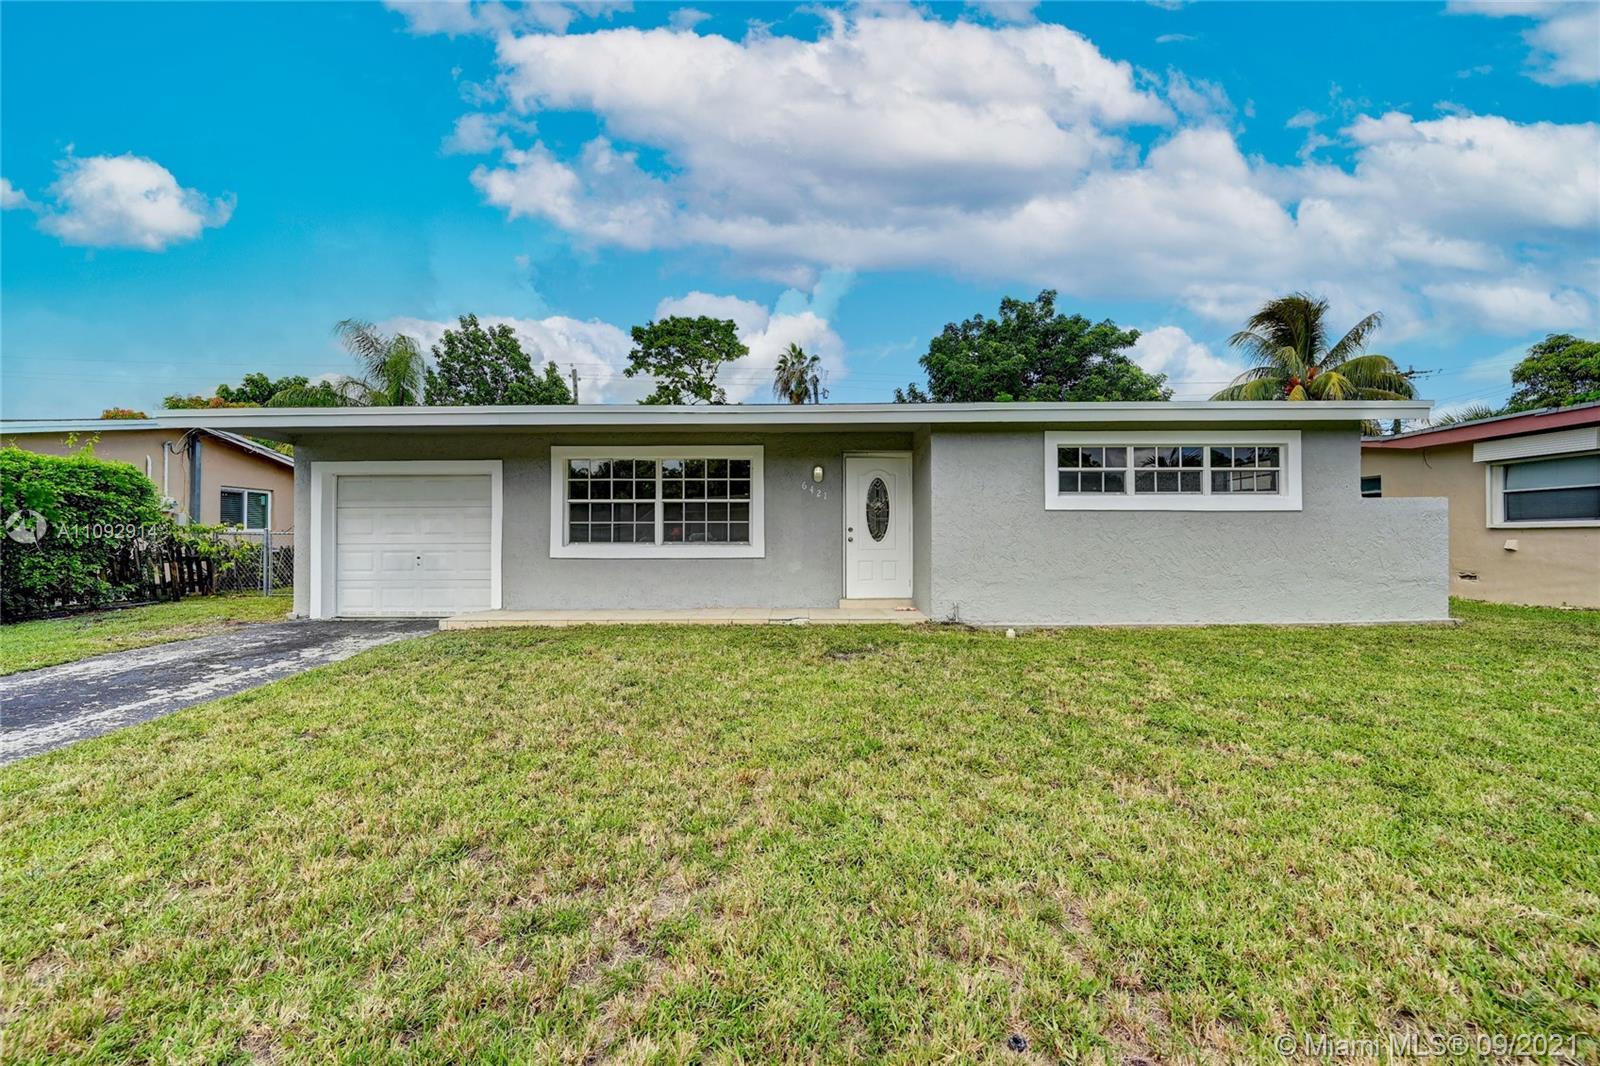 Sunrise Golf Village - 6421 NW 30th St, Sunrise, FL 33313